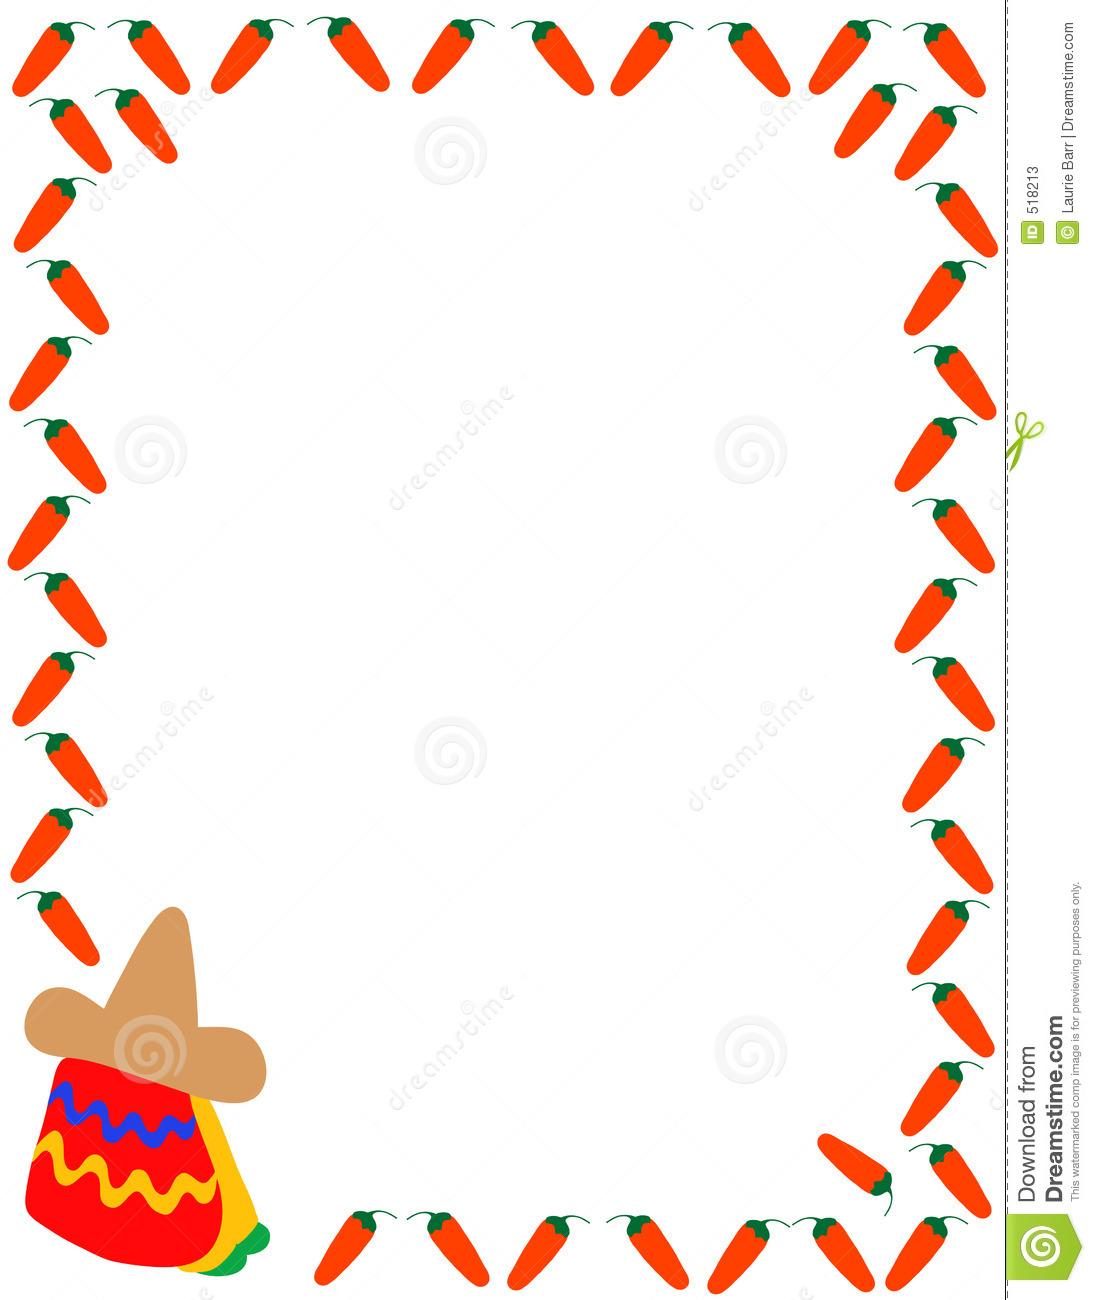 1095x1300 Ice Cream Clipart Border Clipart Panda